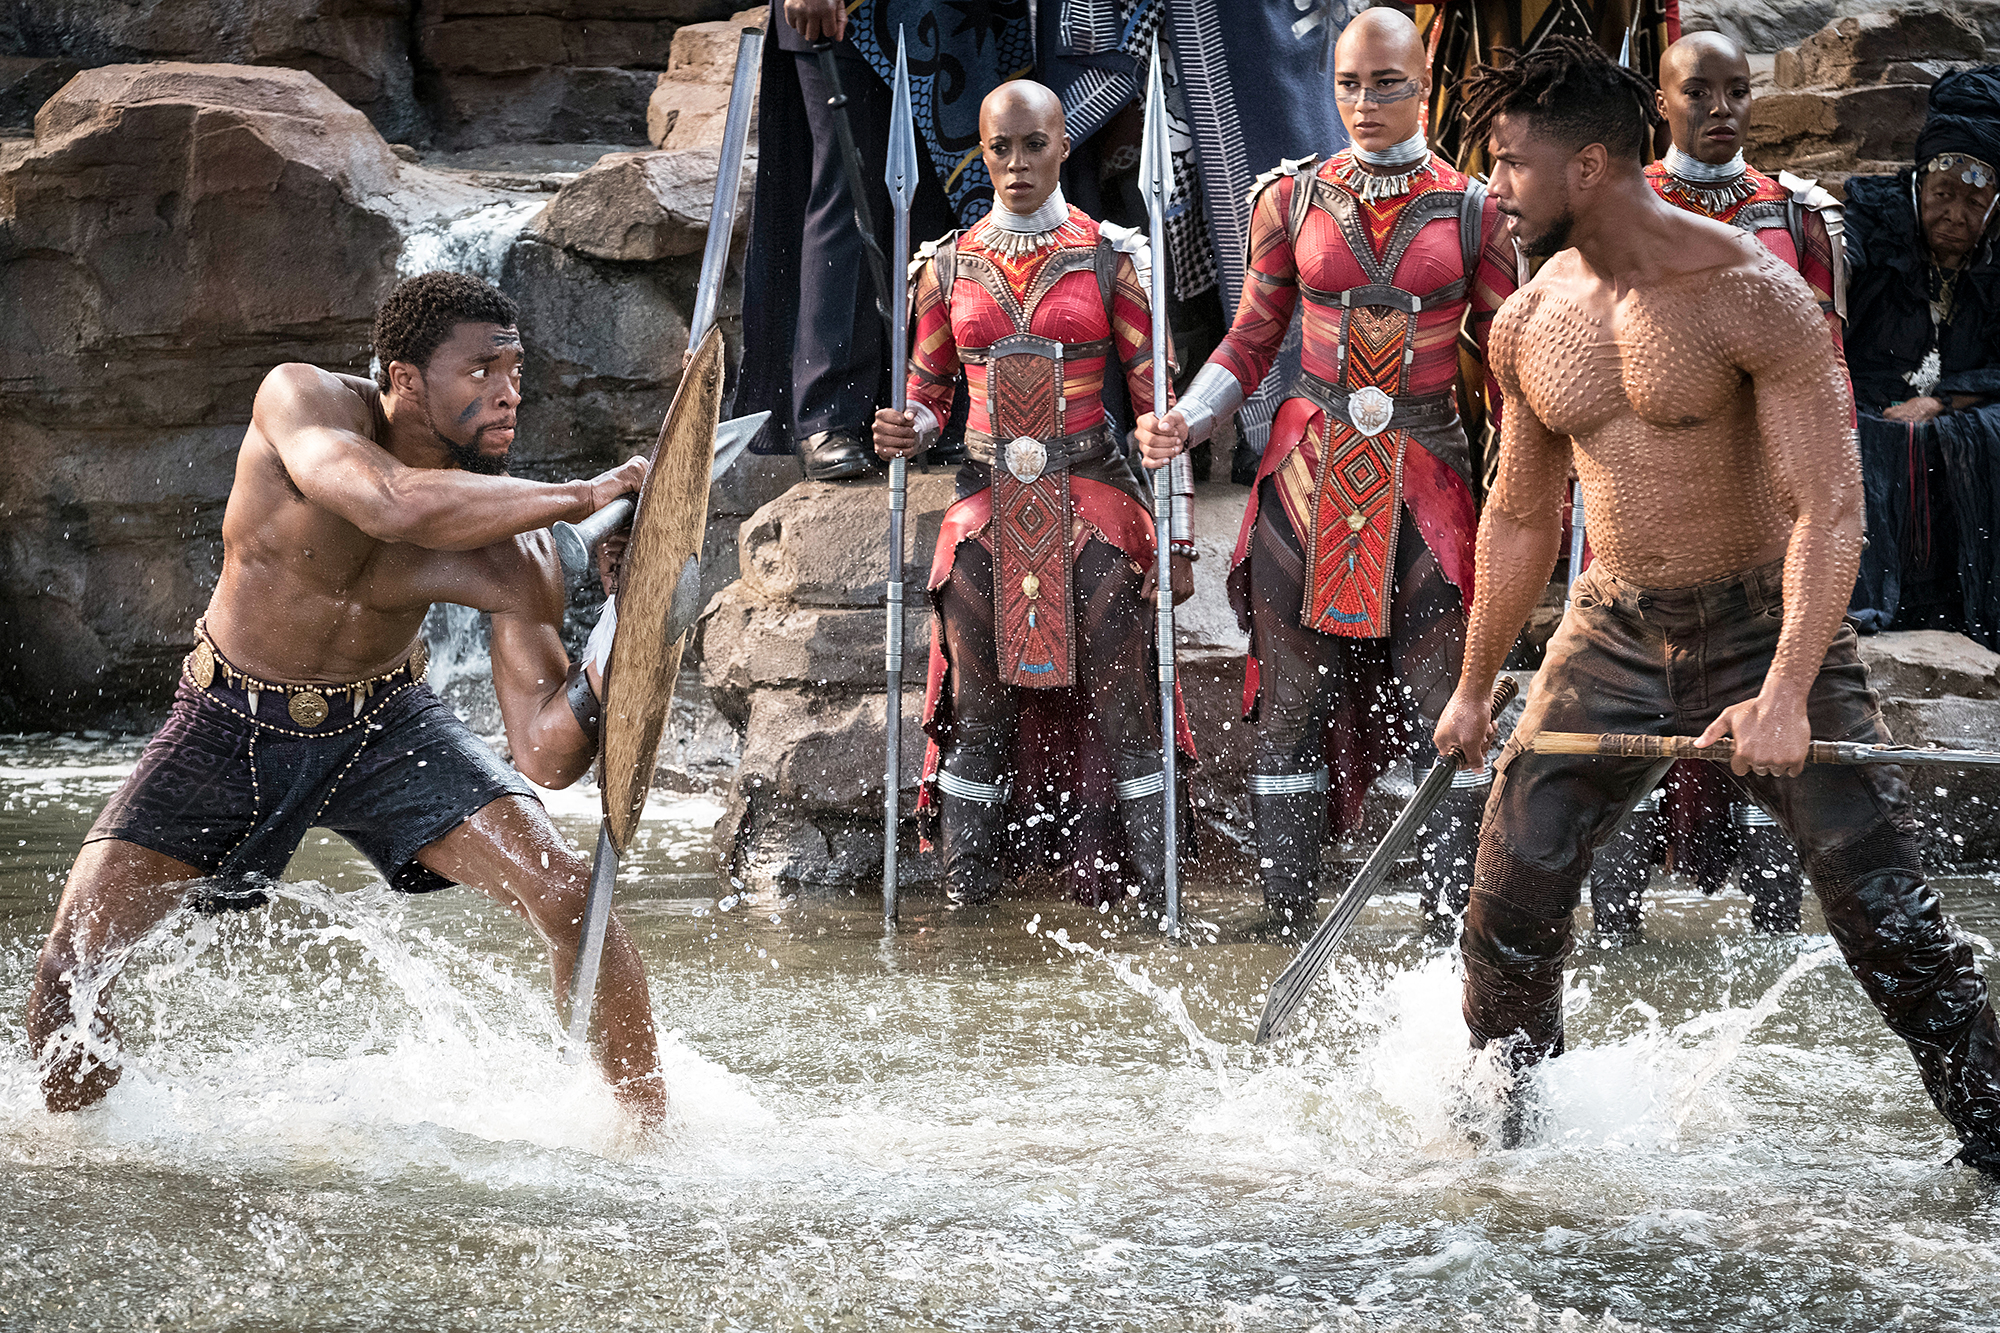 Chadwick Boseman Michael B. Jordan Black Panther Golden Globe Nominations